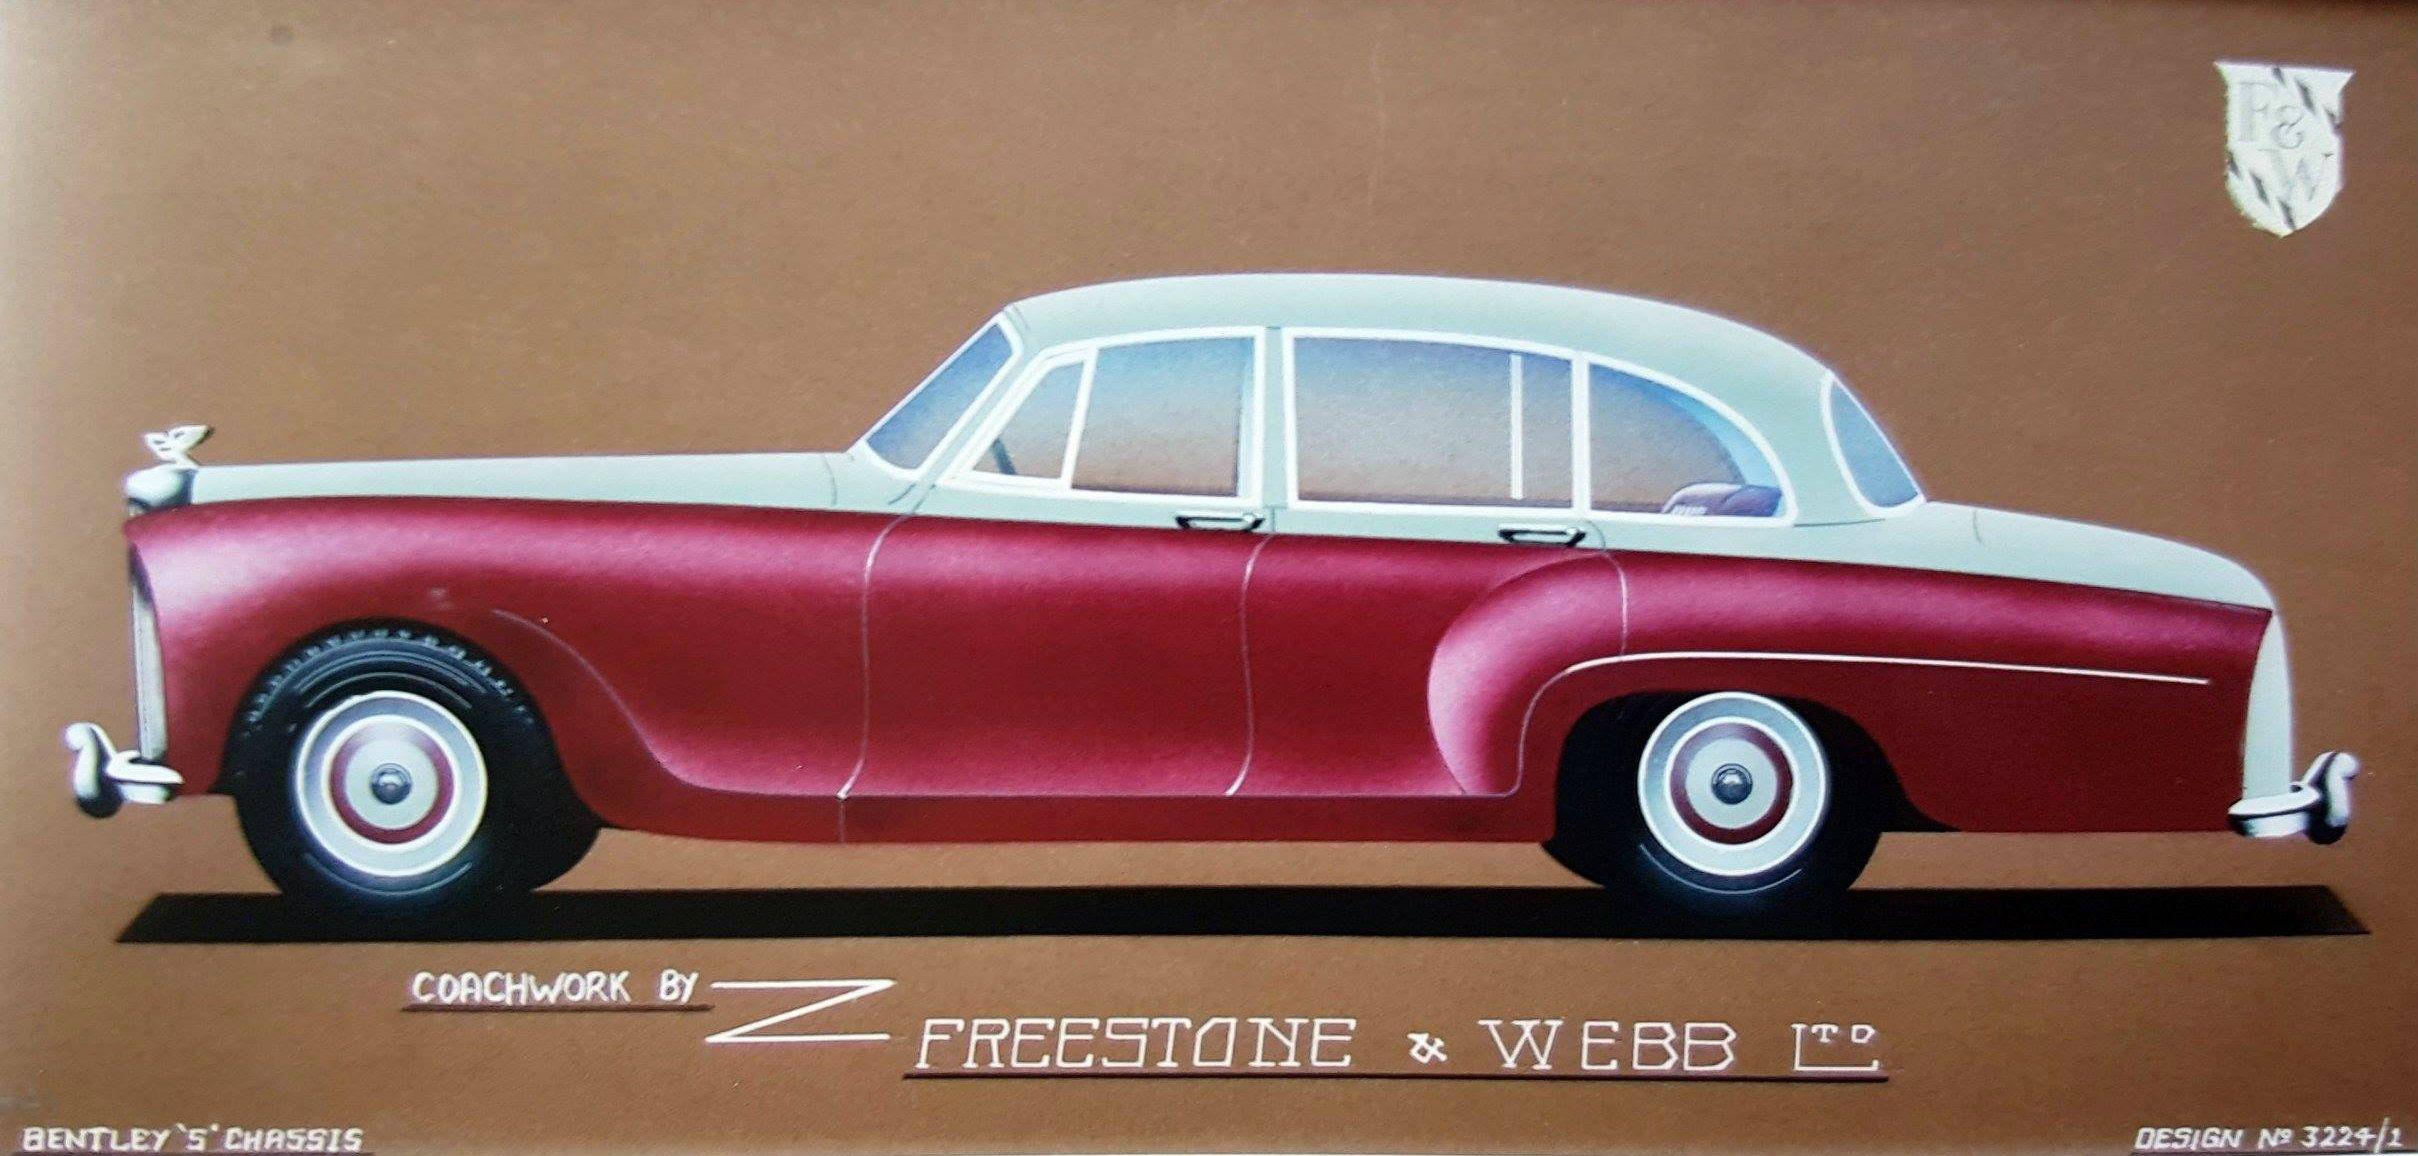 Chassis B354CK (1956) Saloon by Freestone & Webb (design 3224-1) - sketch